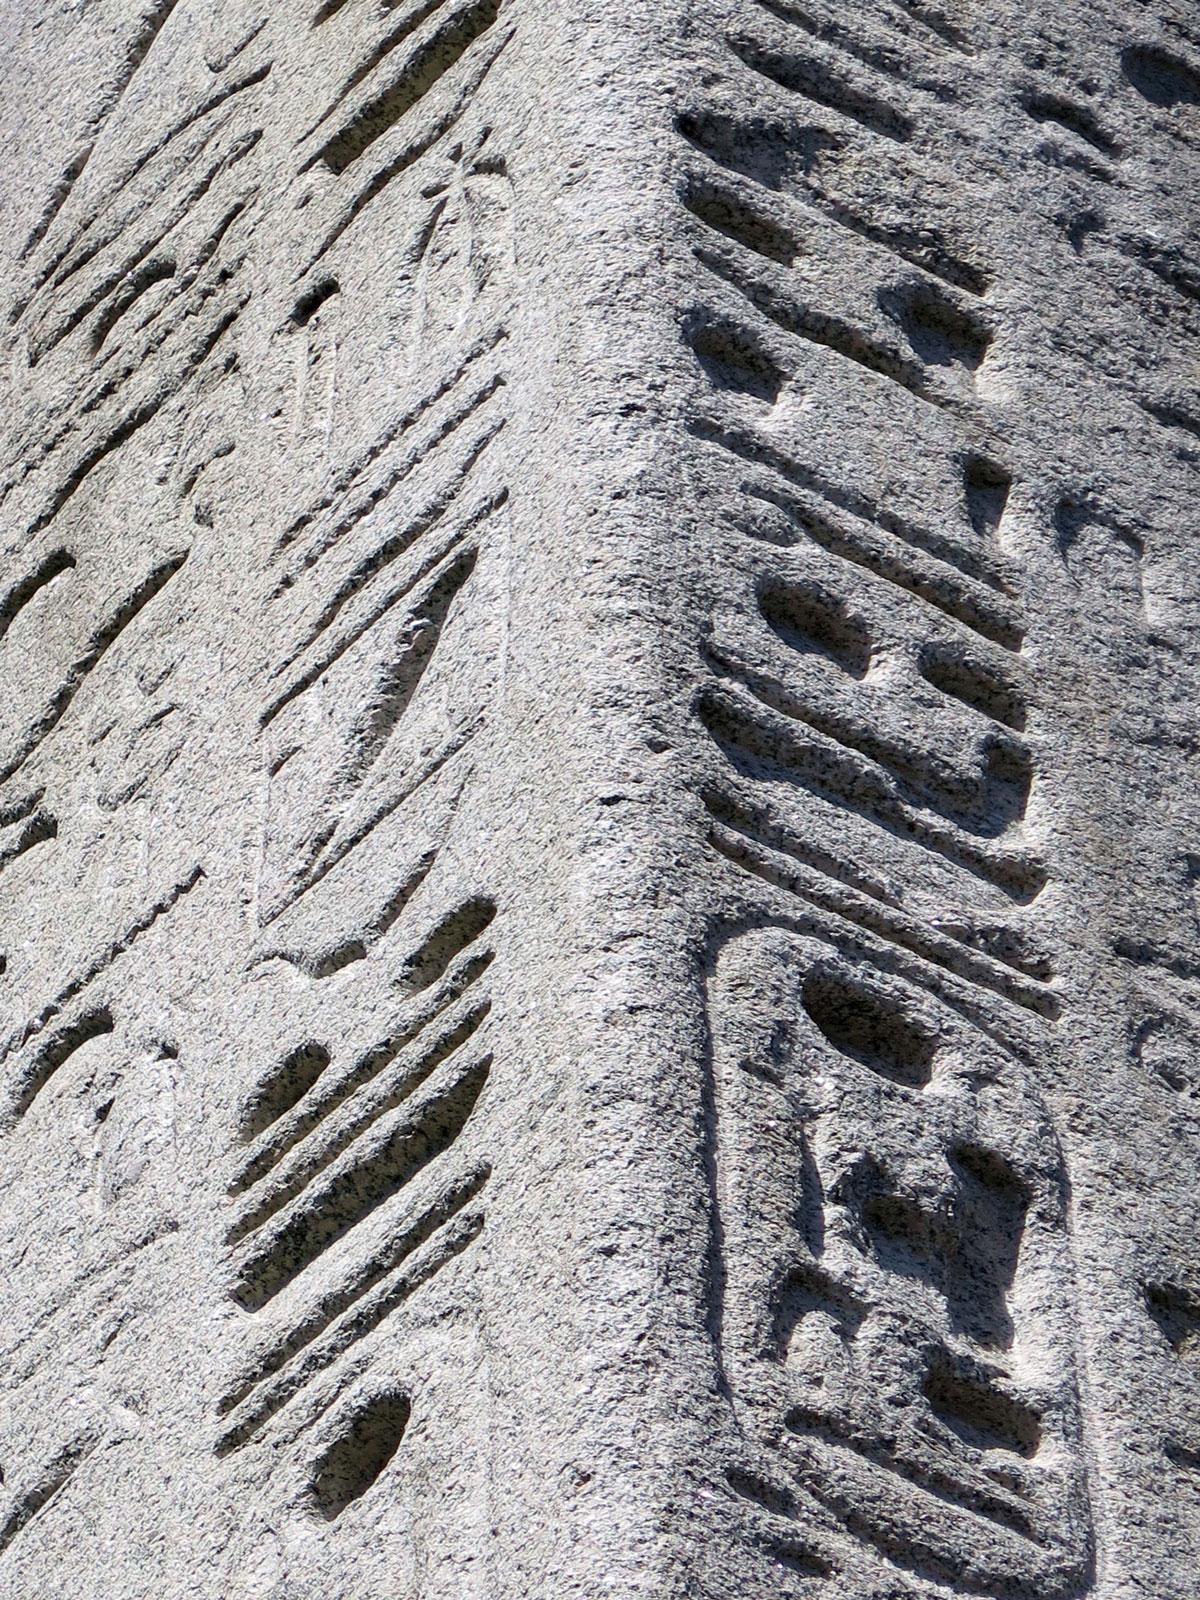 Hieroglyphs on the Obelisk